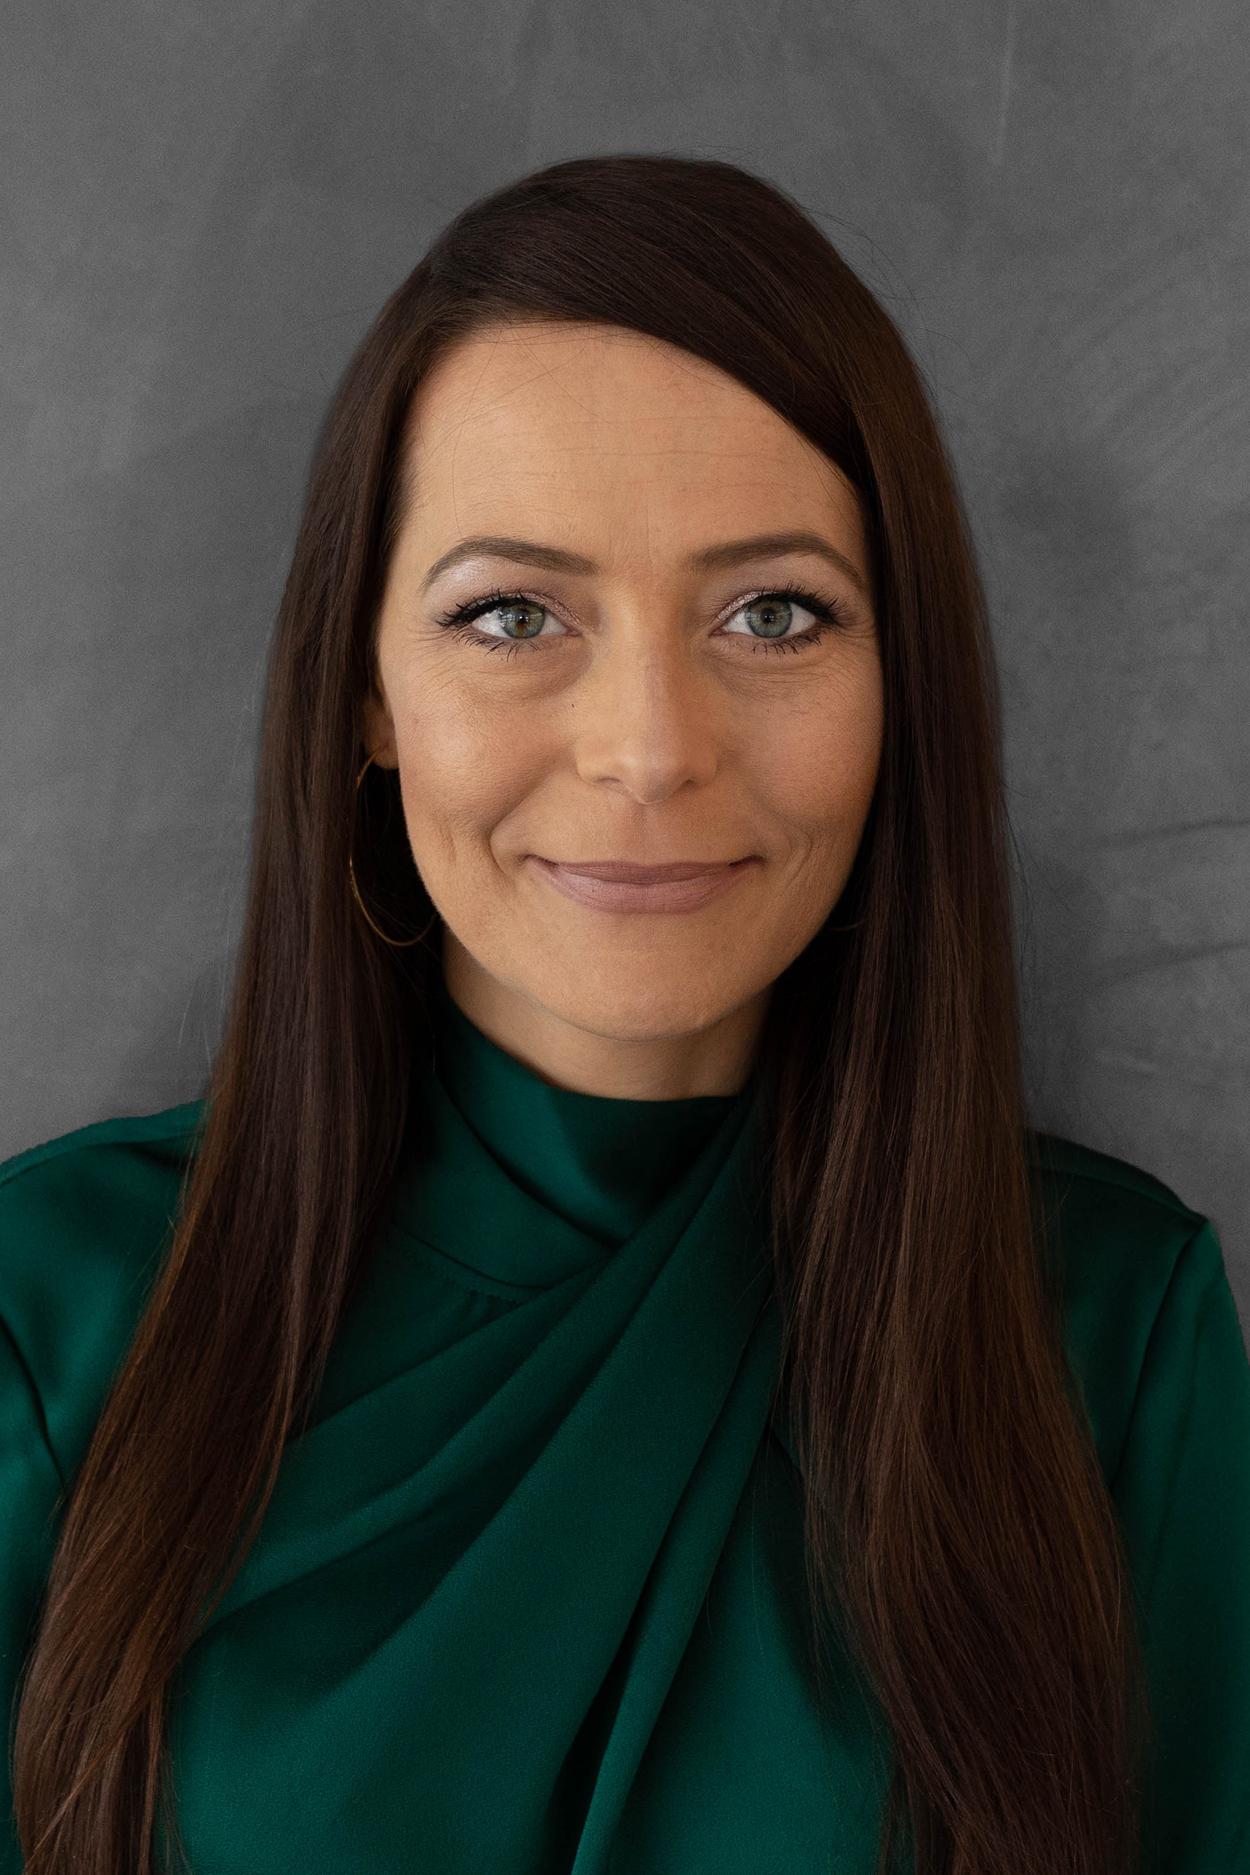 Nicole Wieser